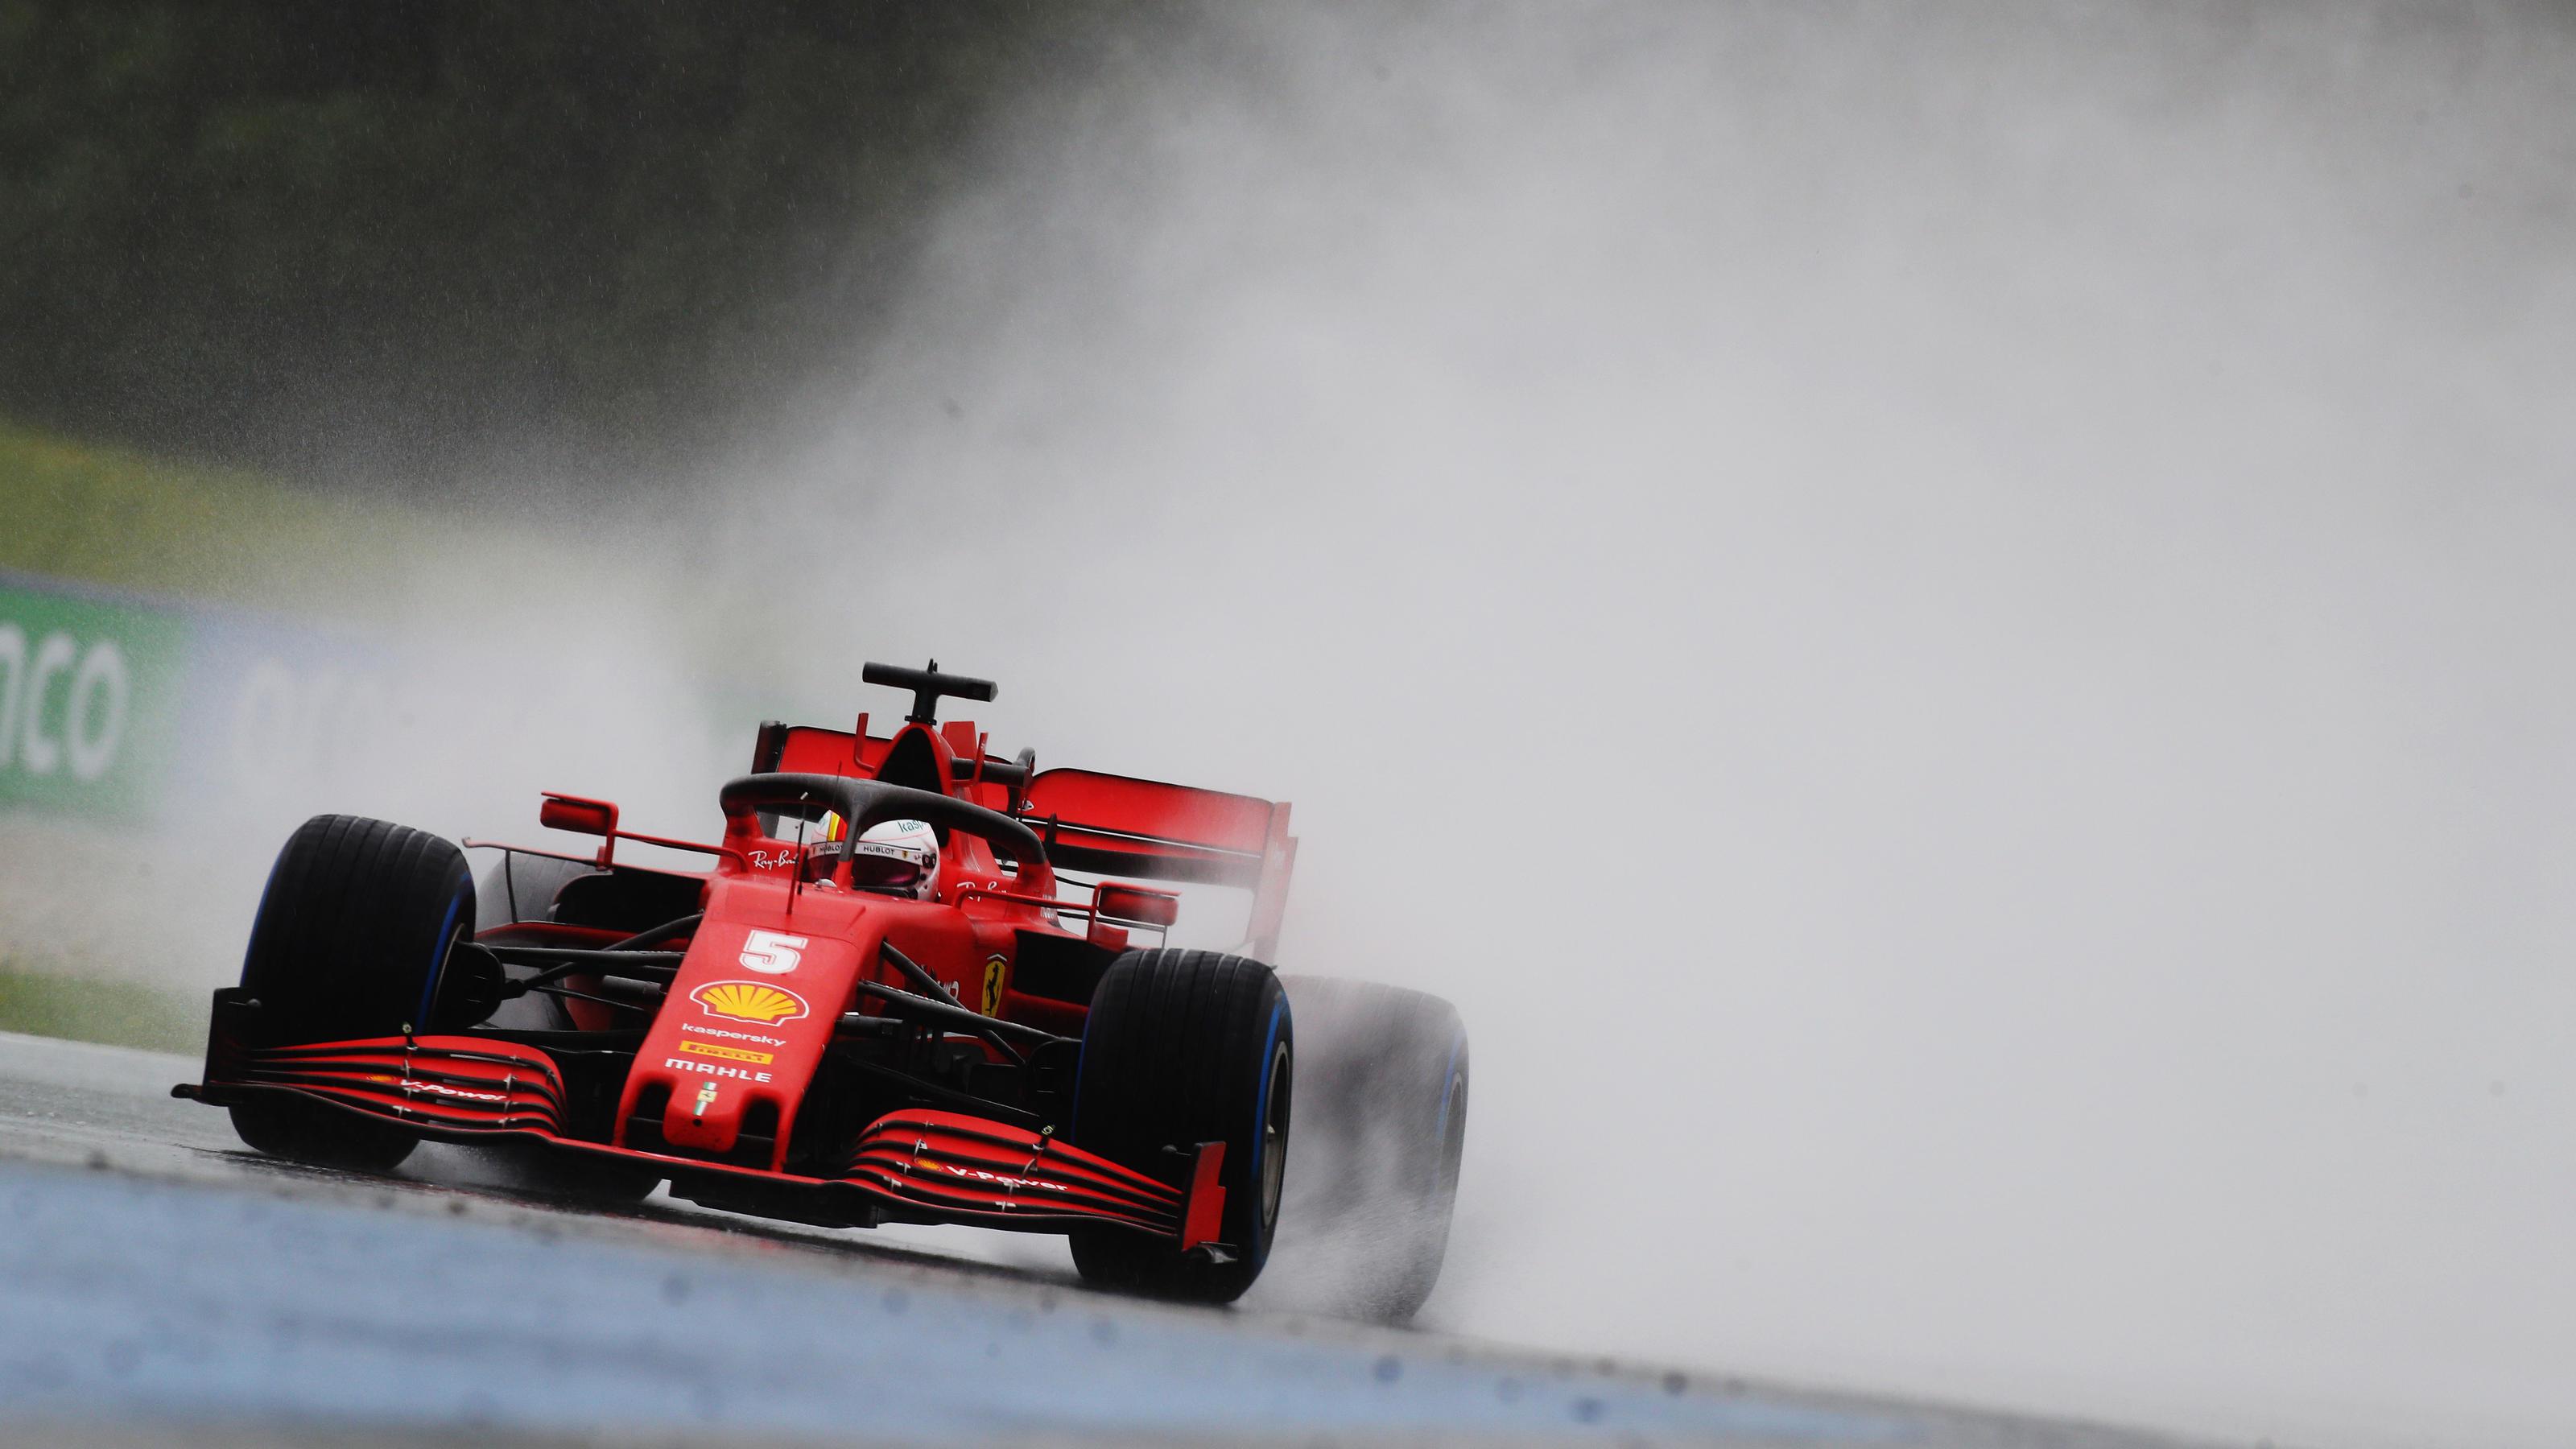 Formel 1 Rtl Live